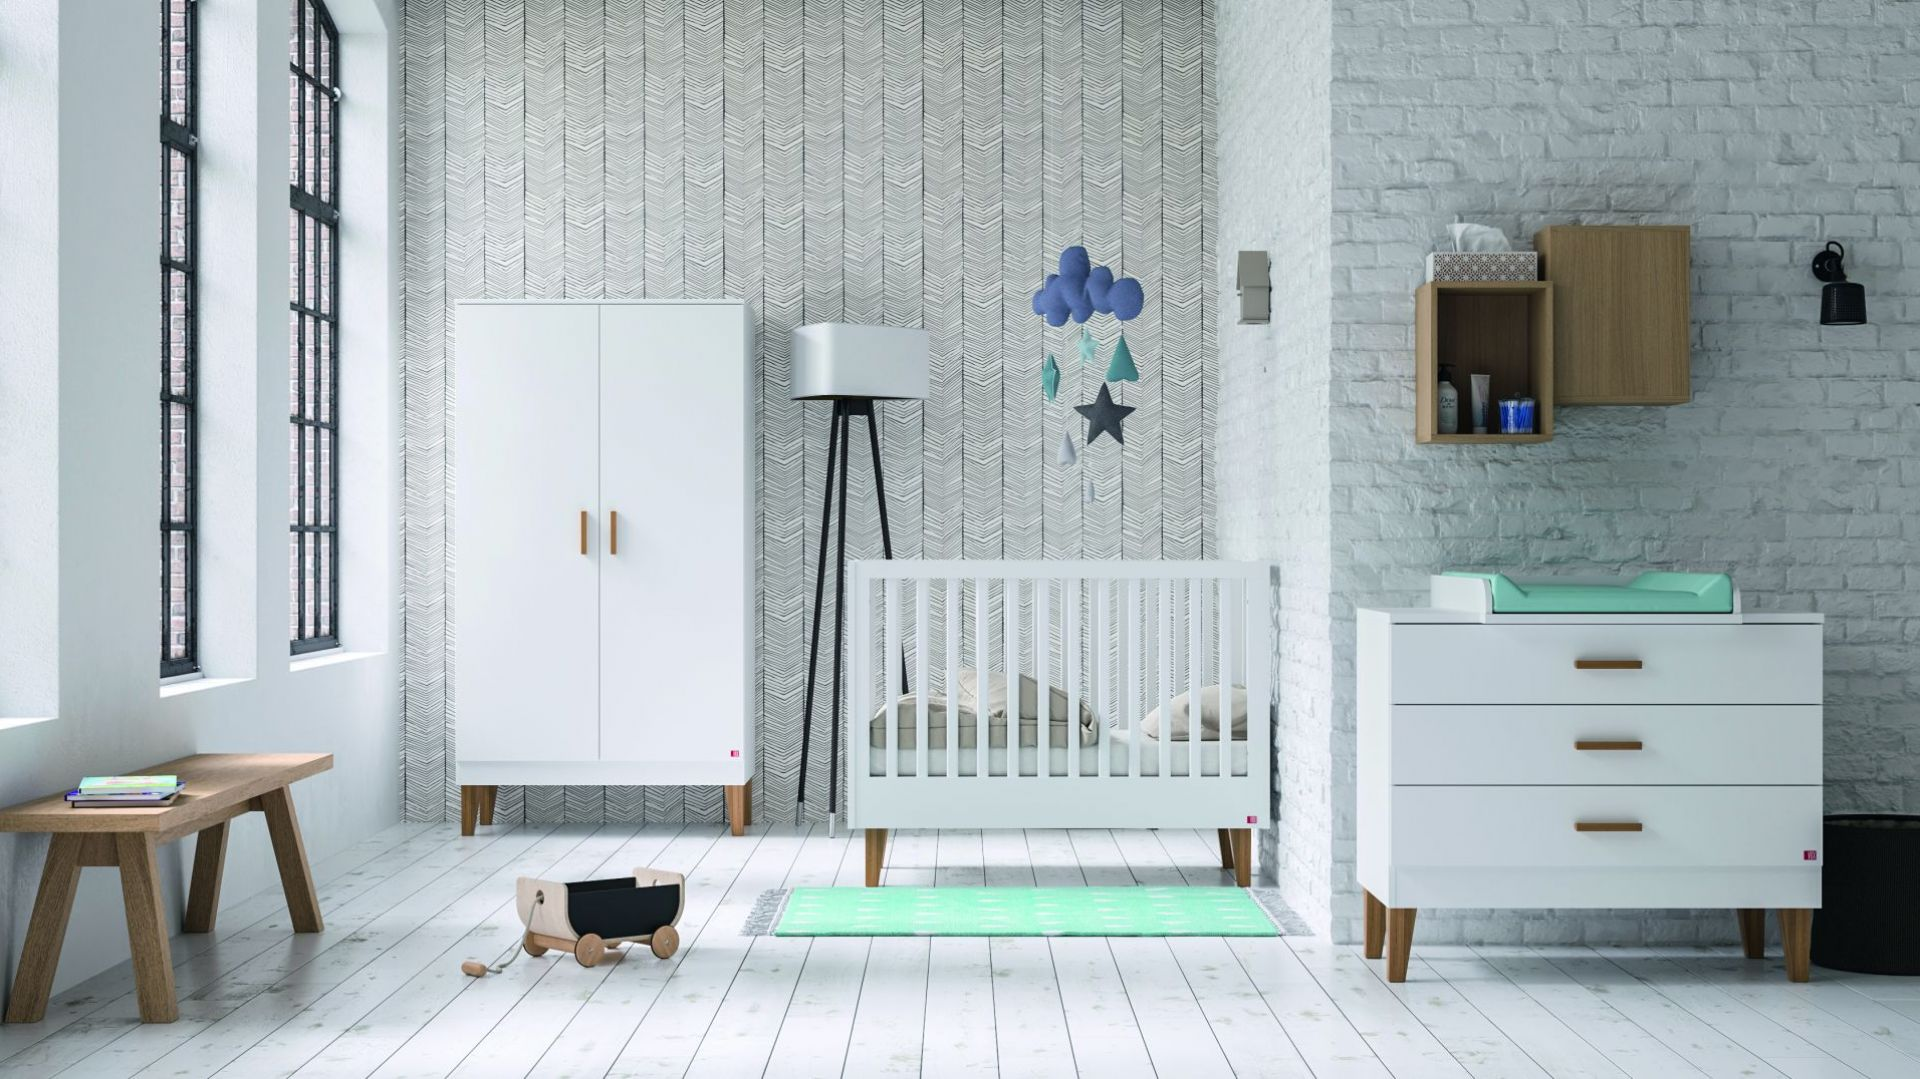 Meble do pokoju dziecka - kolekcja Lounge. Fot. Vox